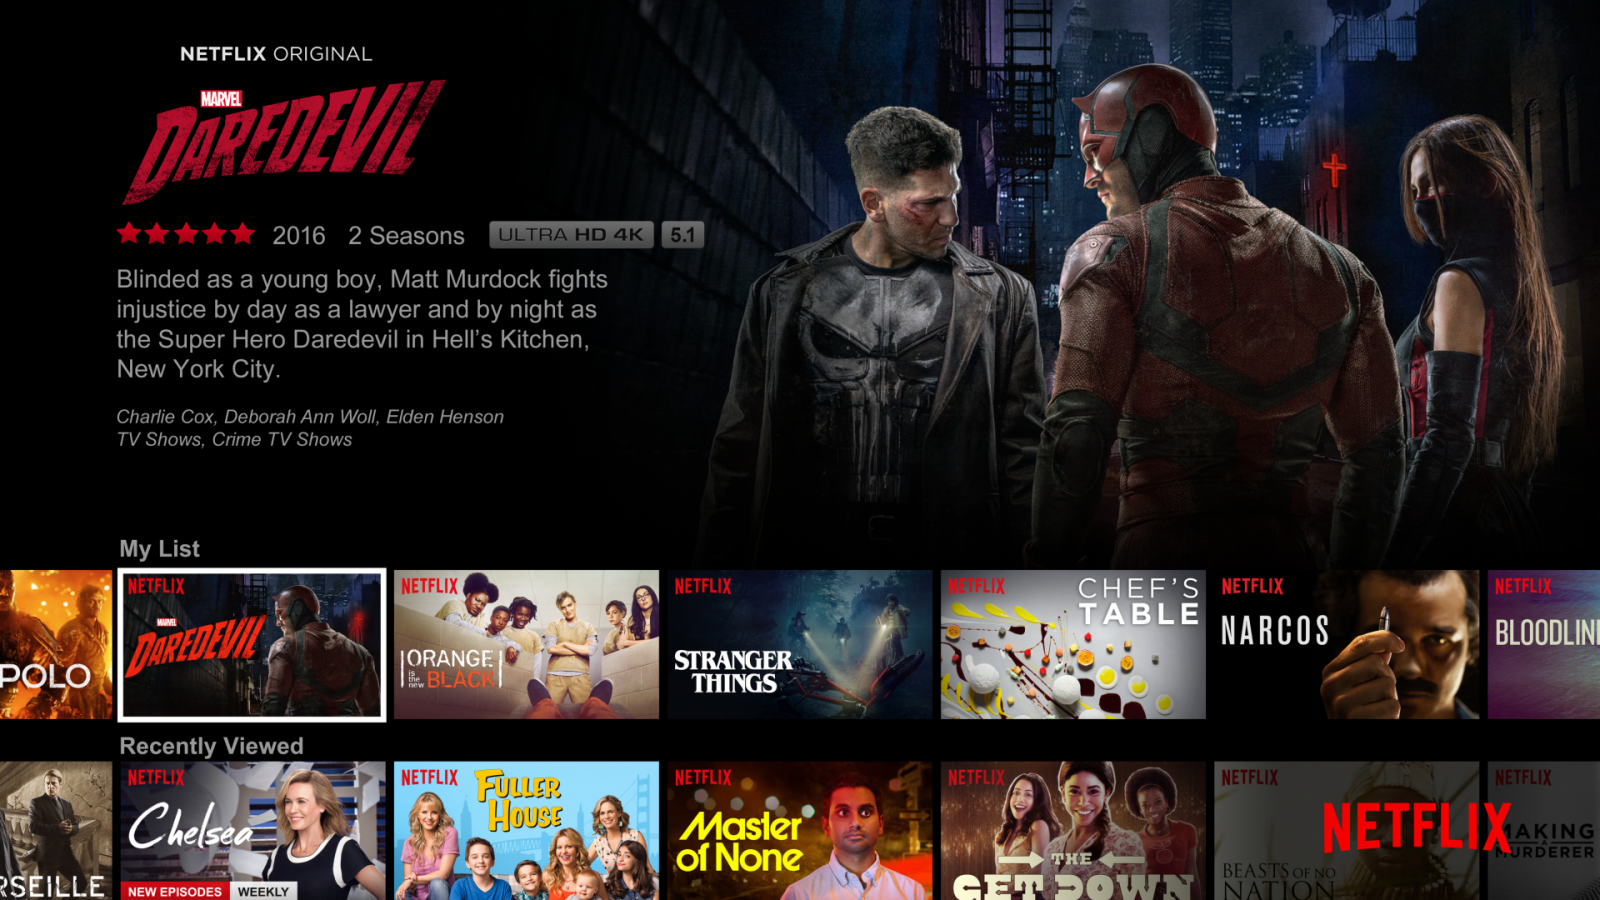 Netflix best entertainment product 2016 technology awards